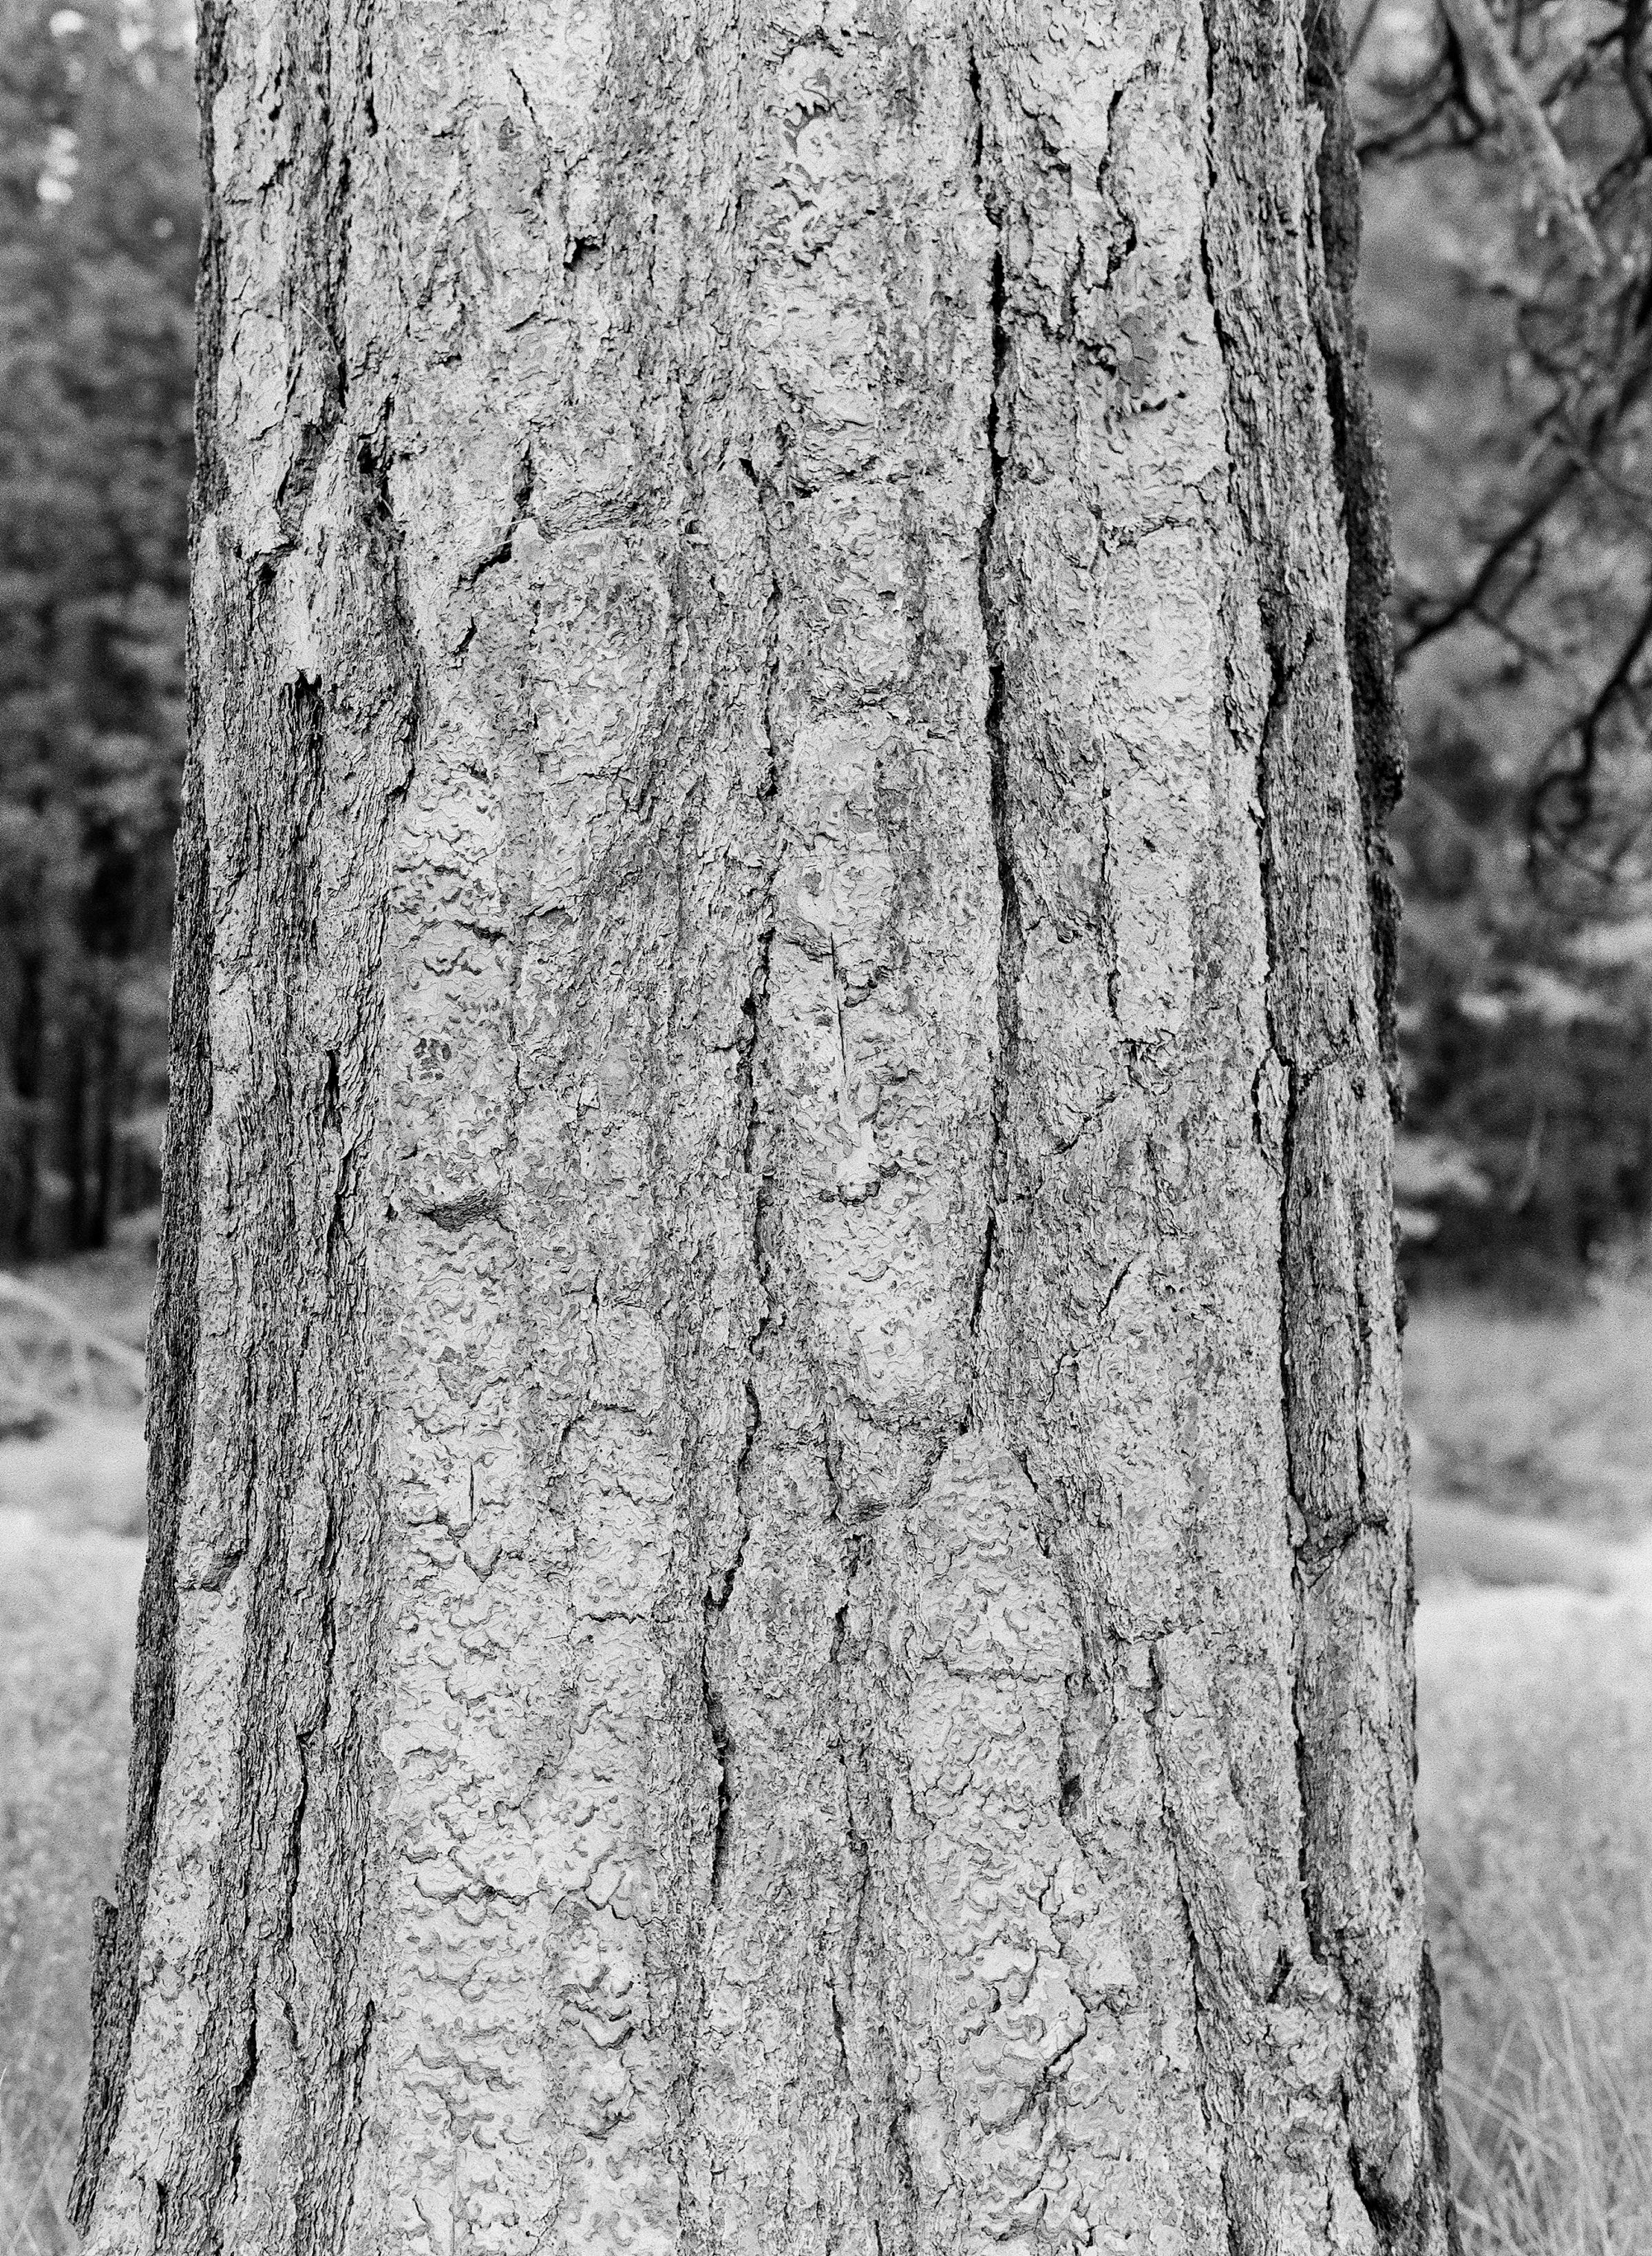 Bark, El Capitan Meadow